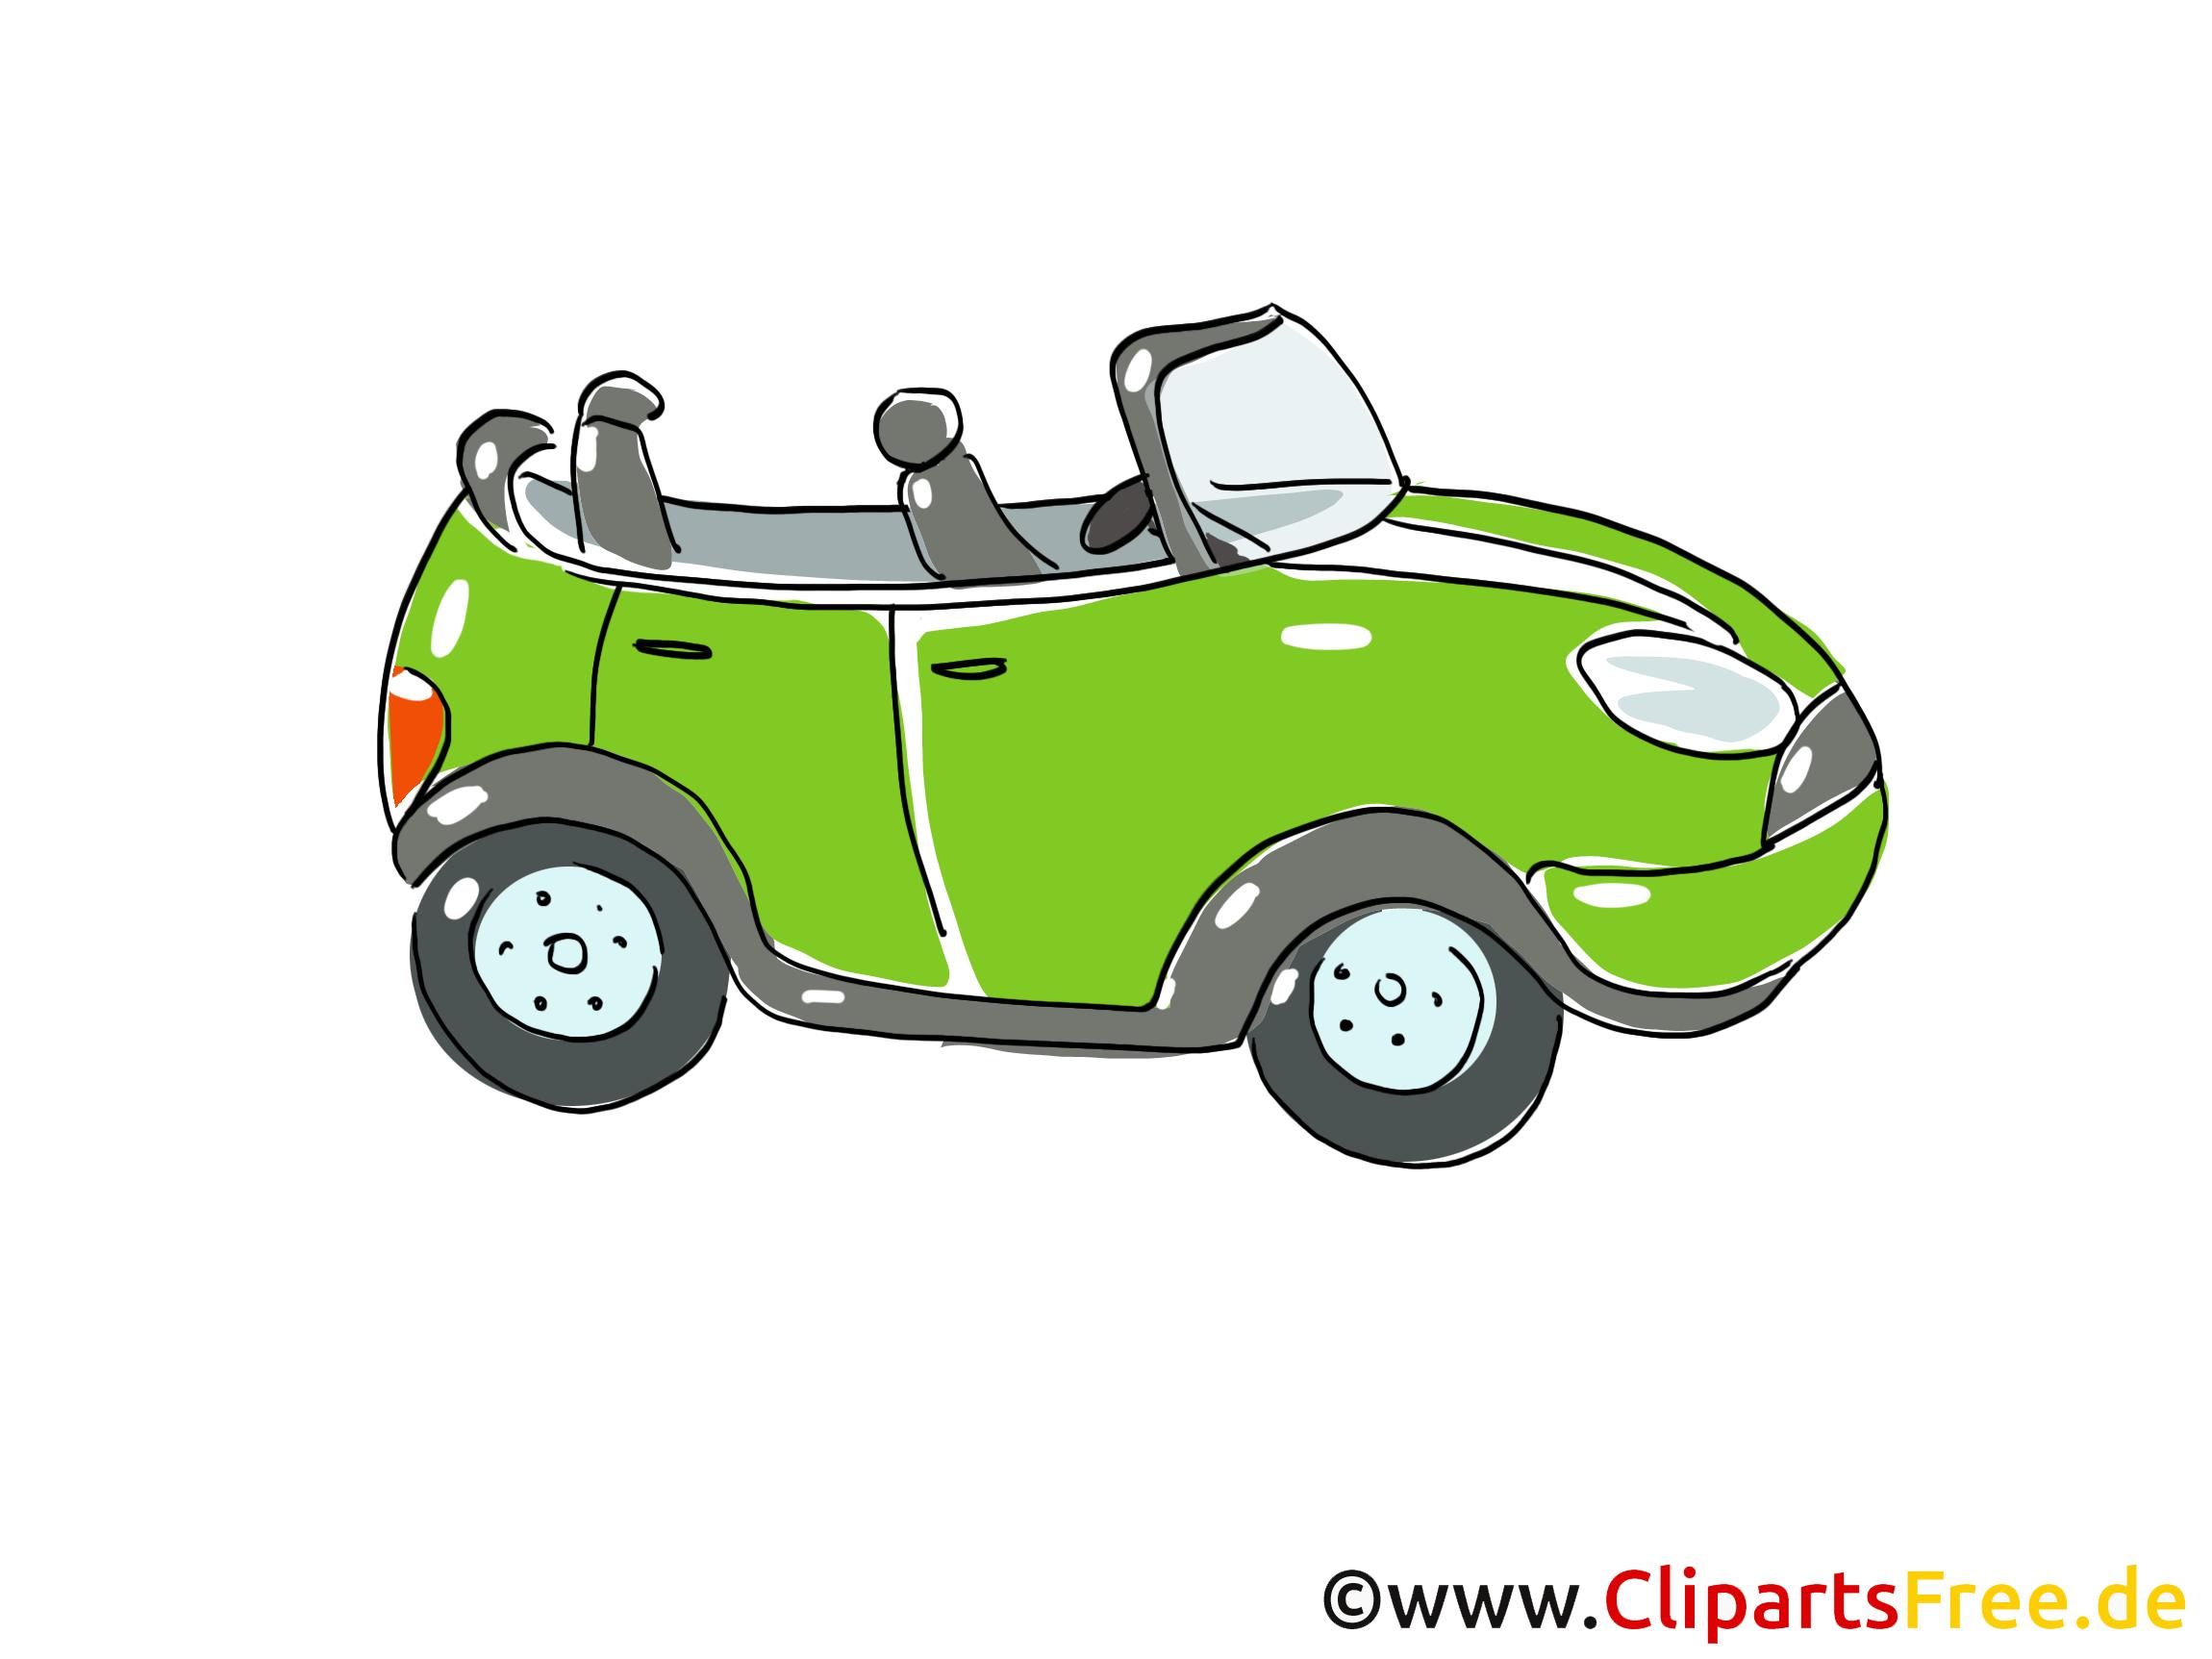 Cabriolet Clipart, Bild, Cartoon, Comic, Grafik.